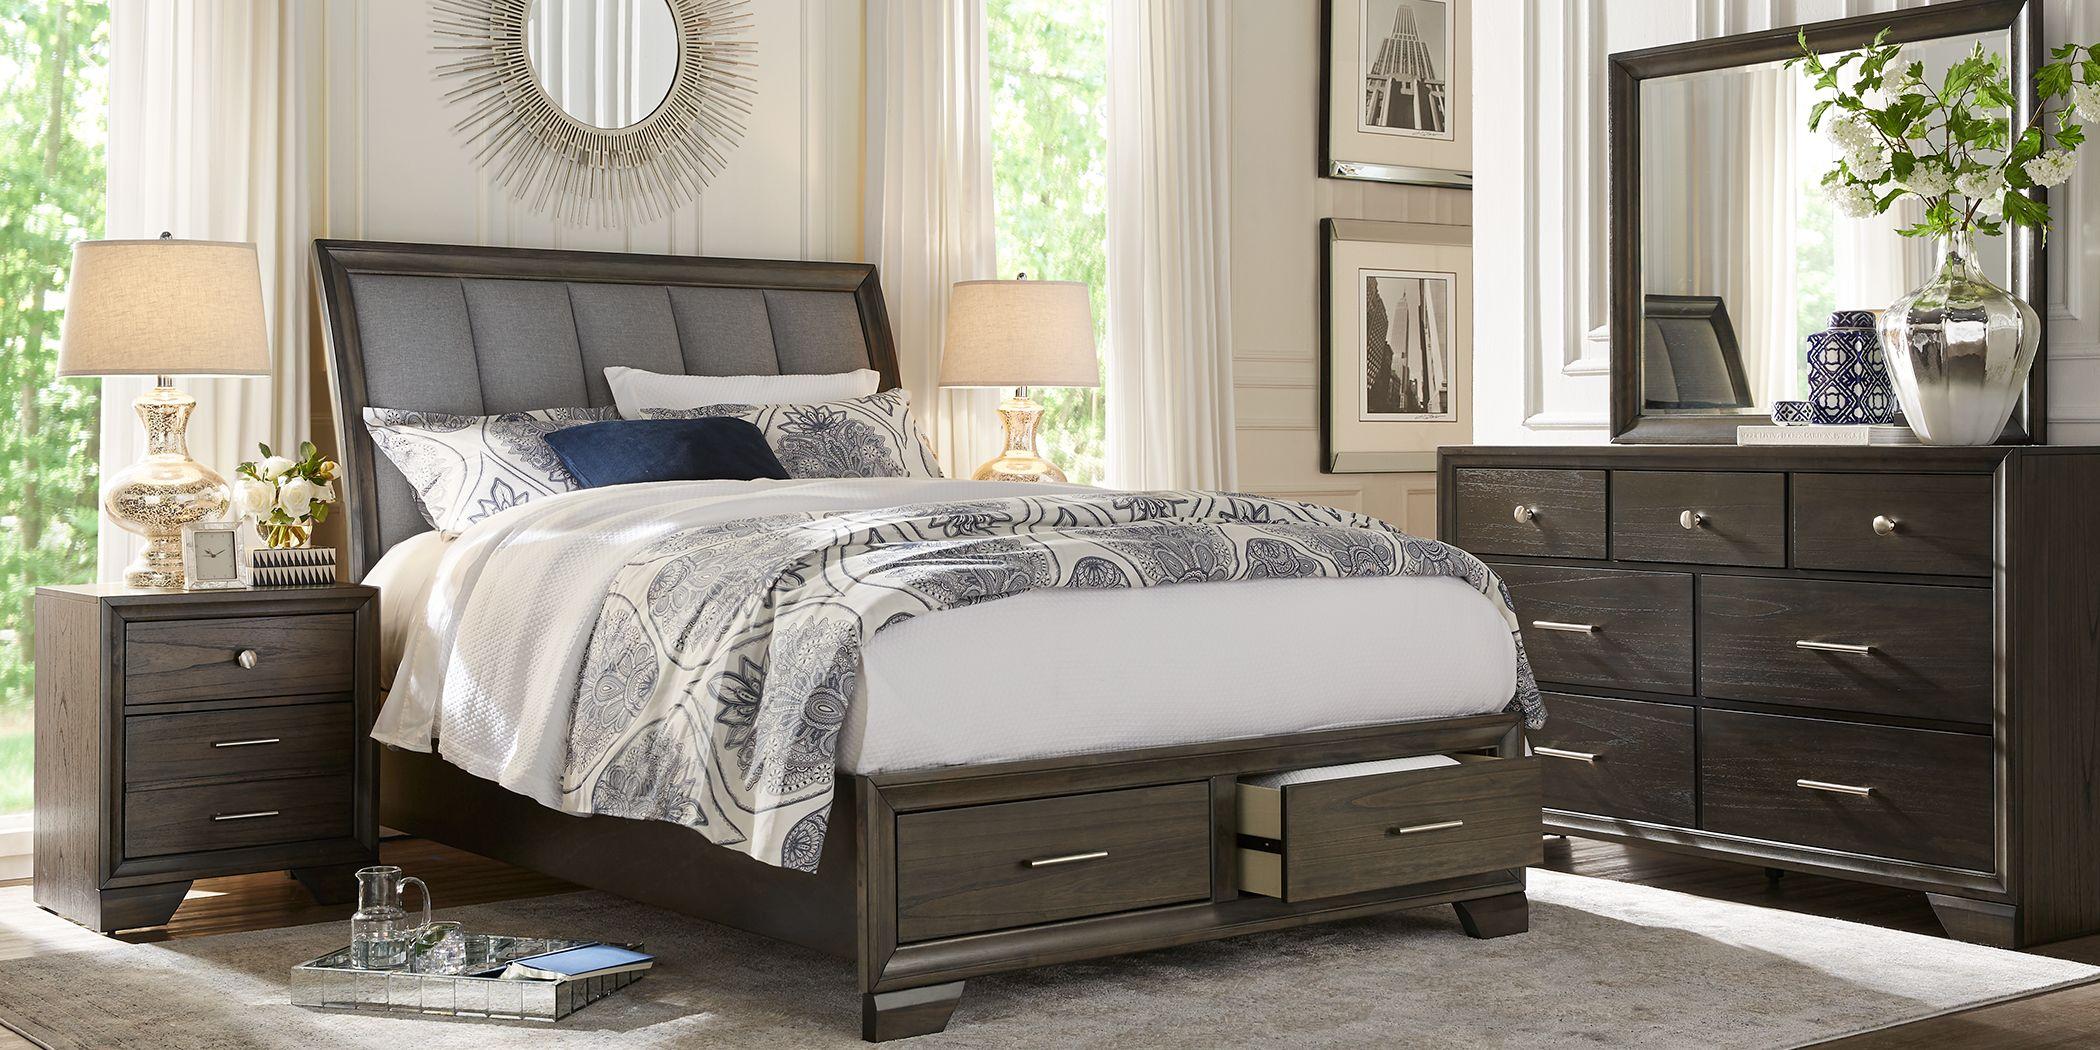 Beckwood Gray 5 Pc King Storage Bedroom